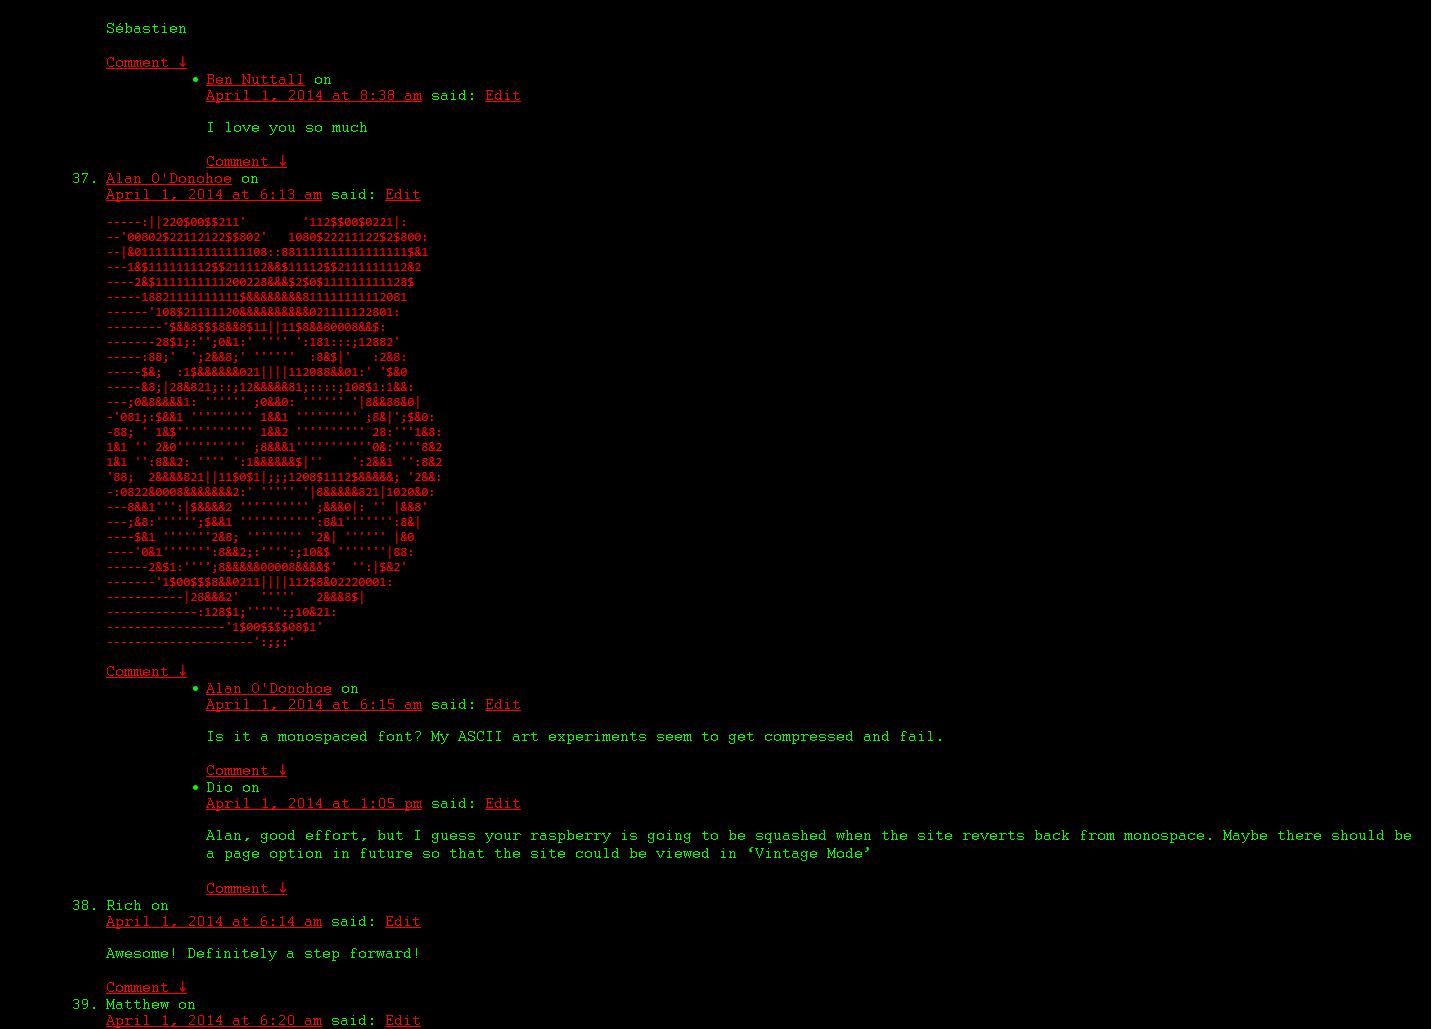 New website design is here! - Raspberry Pi